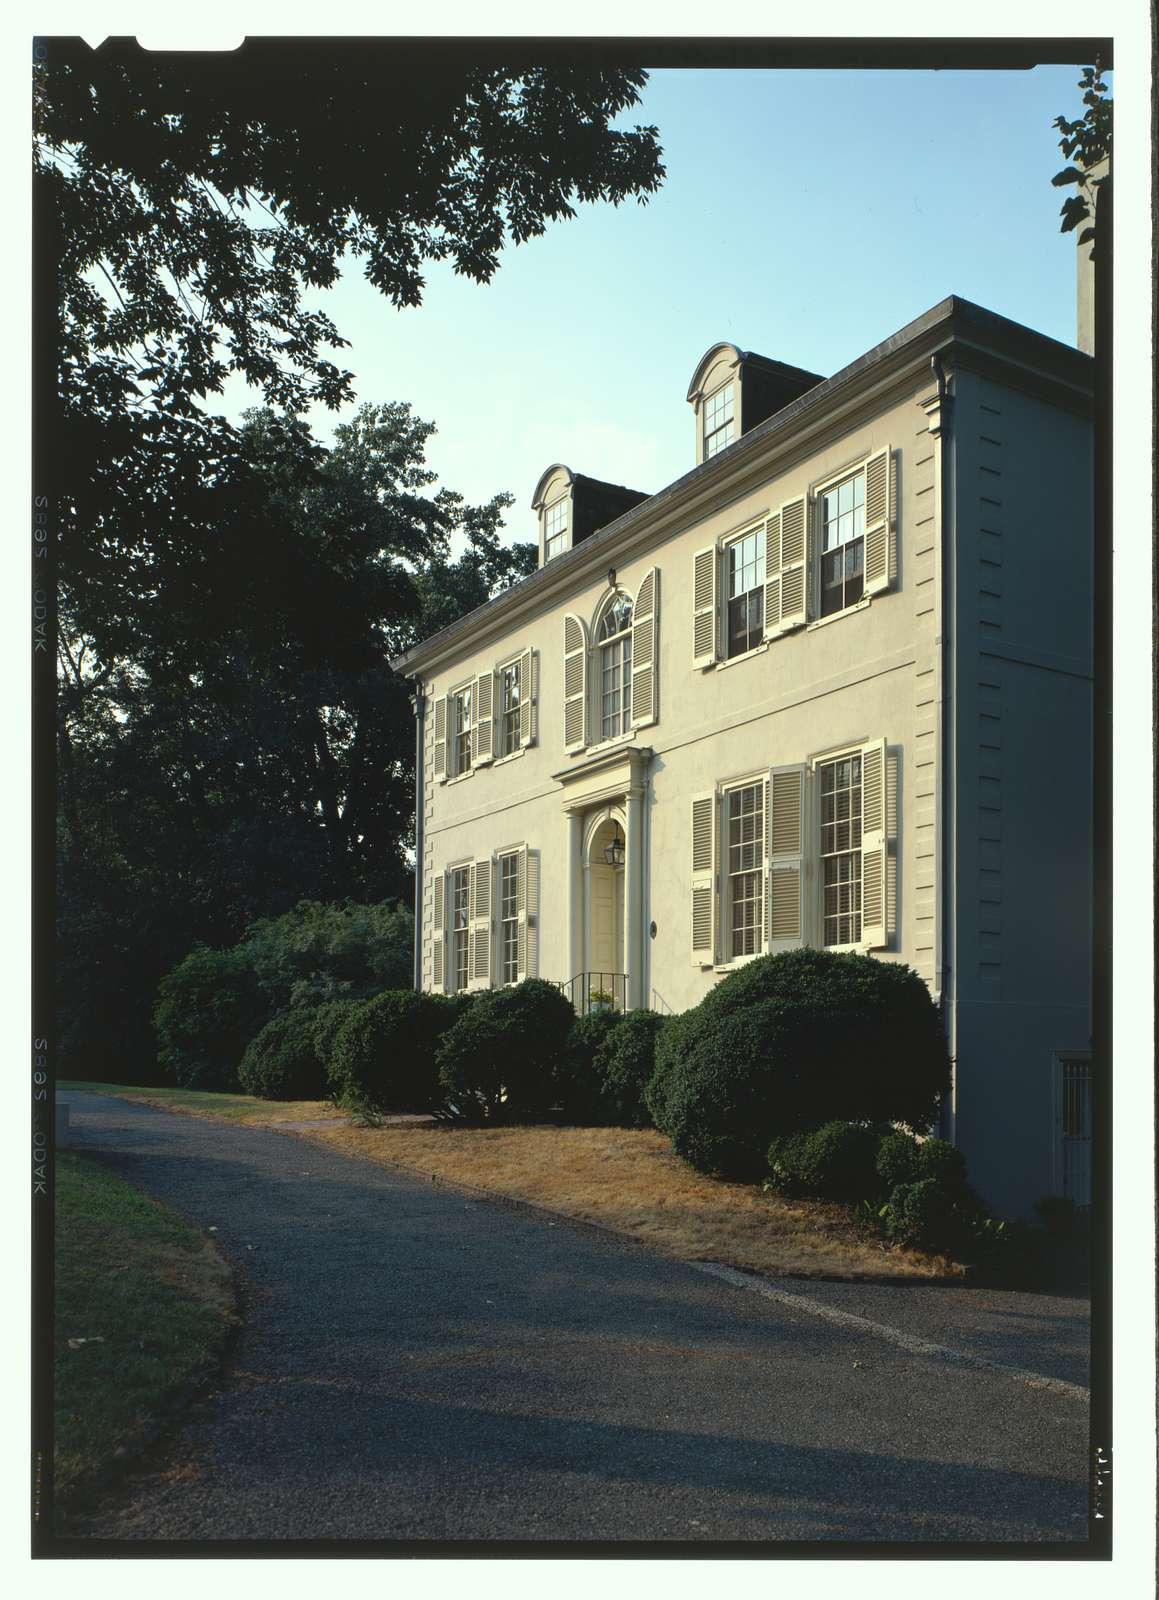 Sweetbriar, 1 Sweetbriar Drive, West Fairmount Park, Philadelphia, Philadelphia County, PA